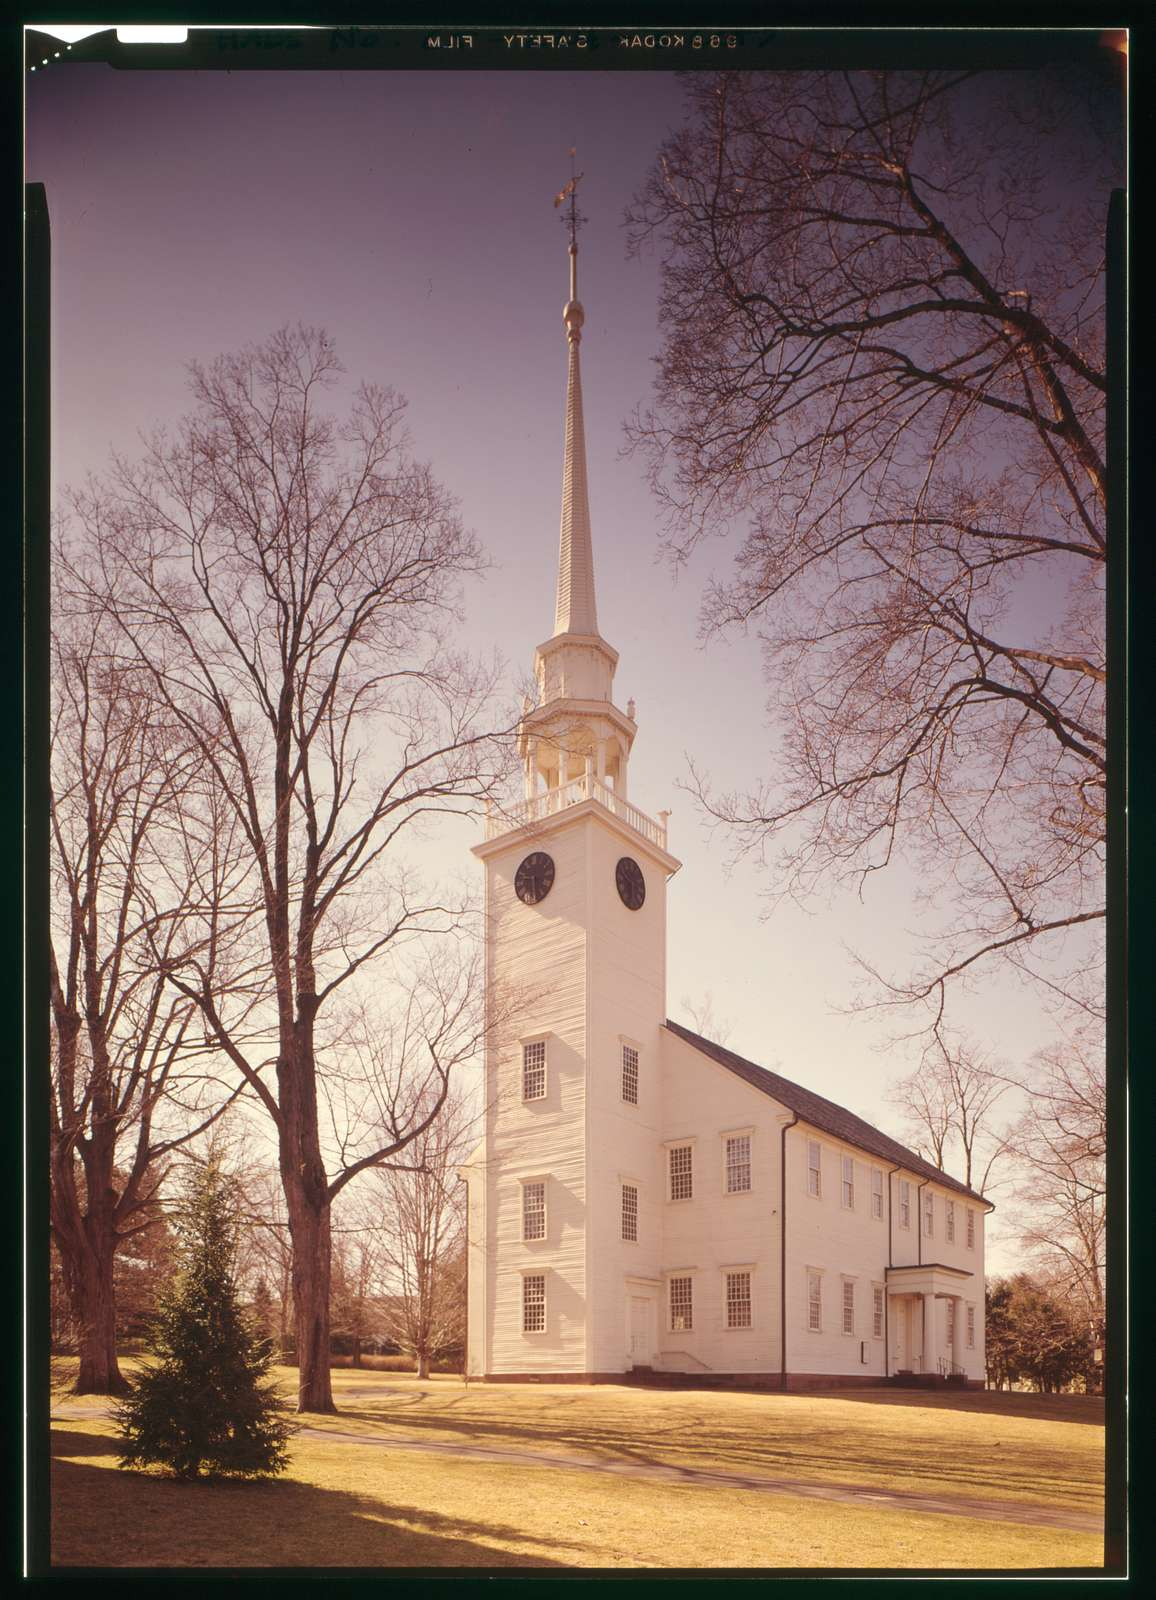 First Church of Christ (Congregational), Main Street, between School & Church Streets, Farmington, Hartford County, CT